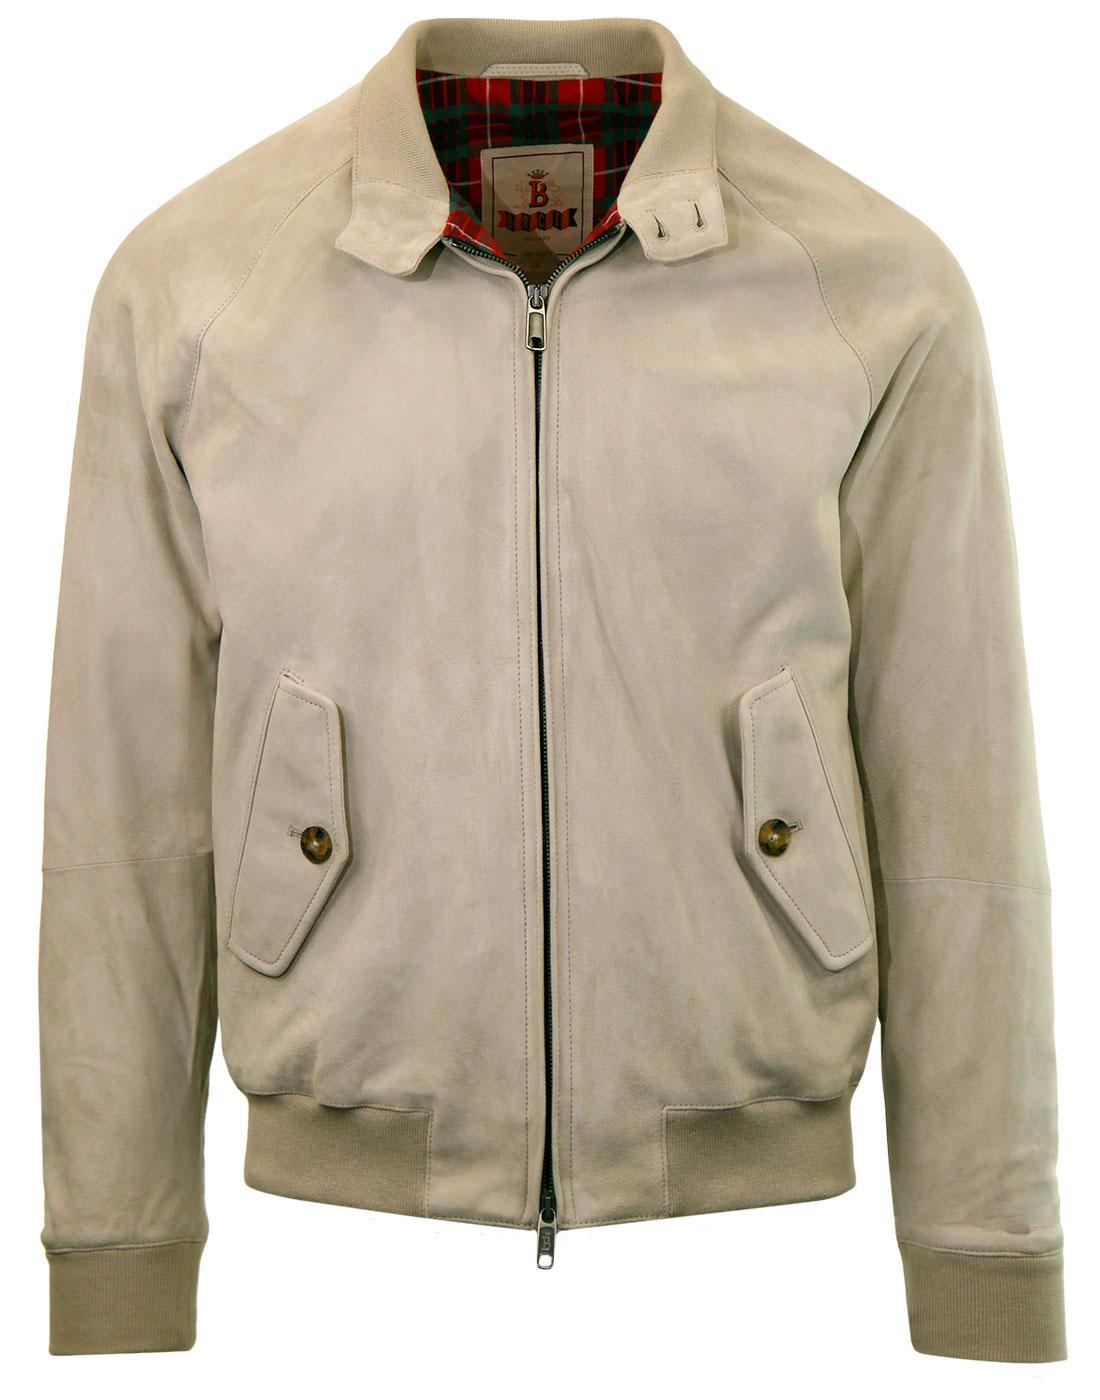 ben sherman harrington jacket size guide